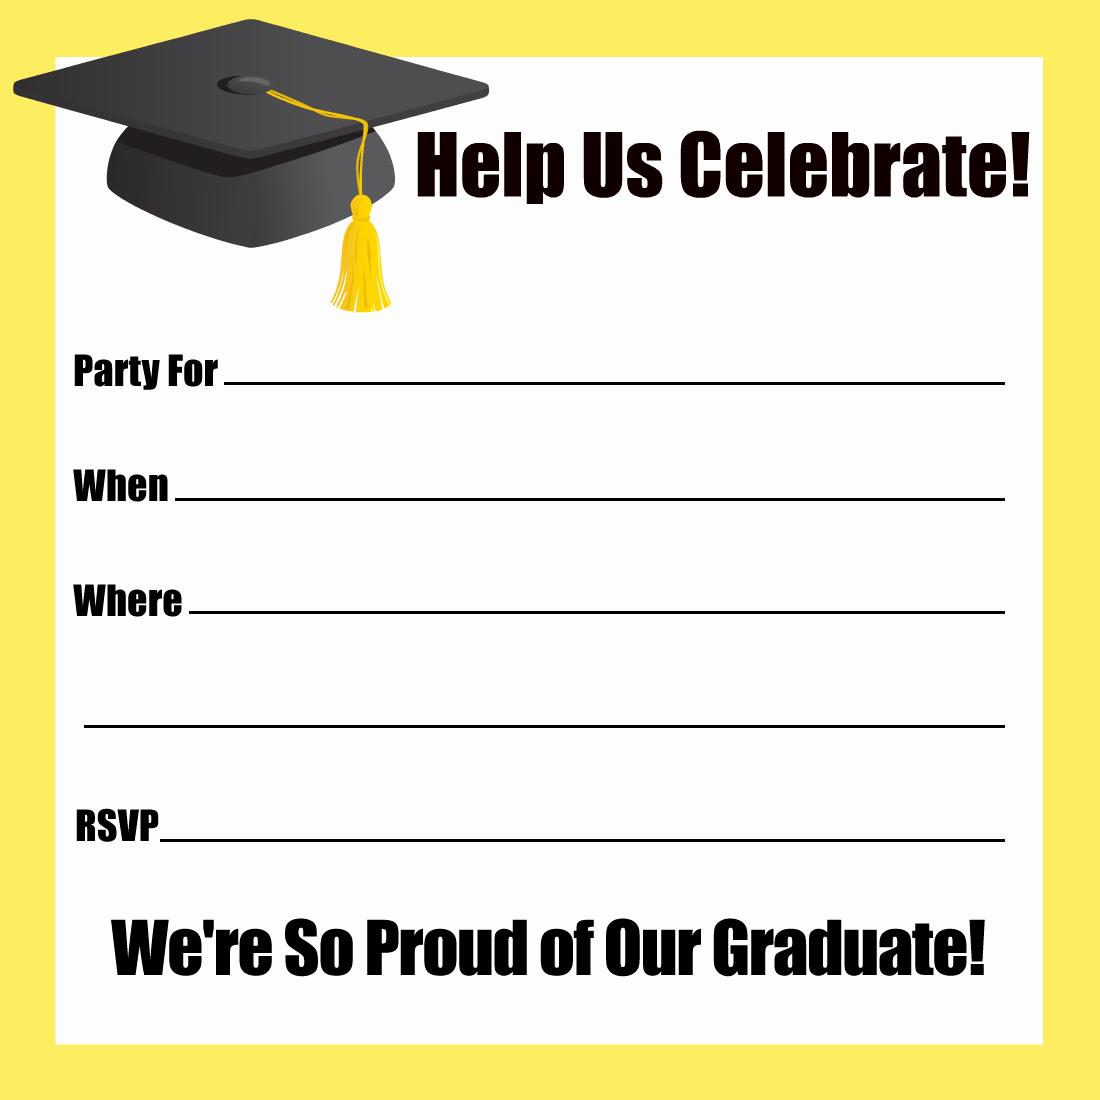 Free Graduation Party Invitations Templates Luxury Free Printable Graduation Party Invitations Templates